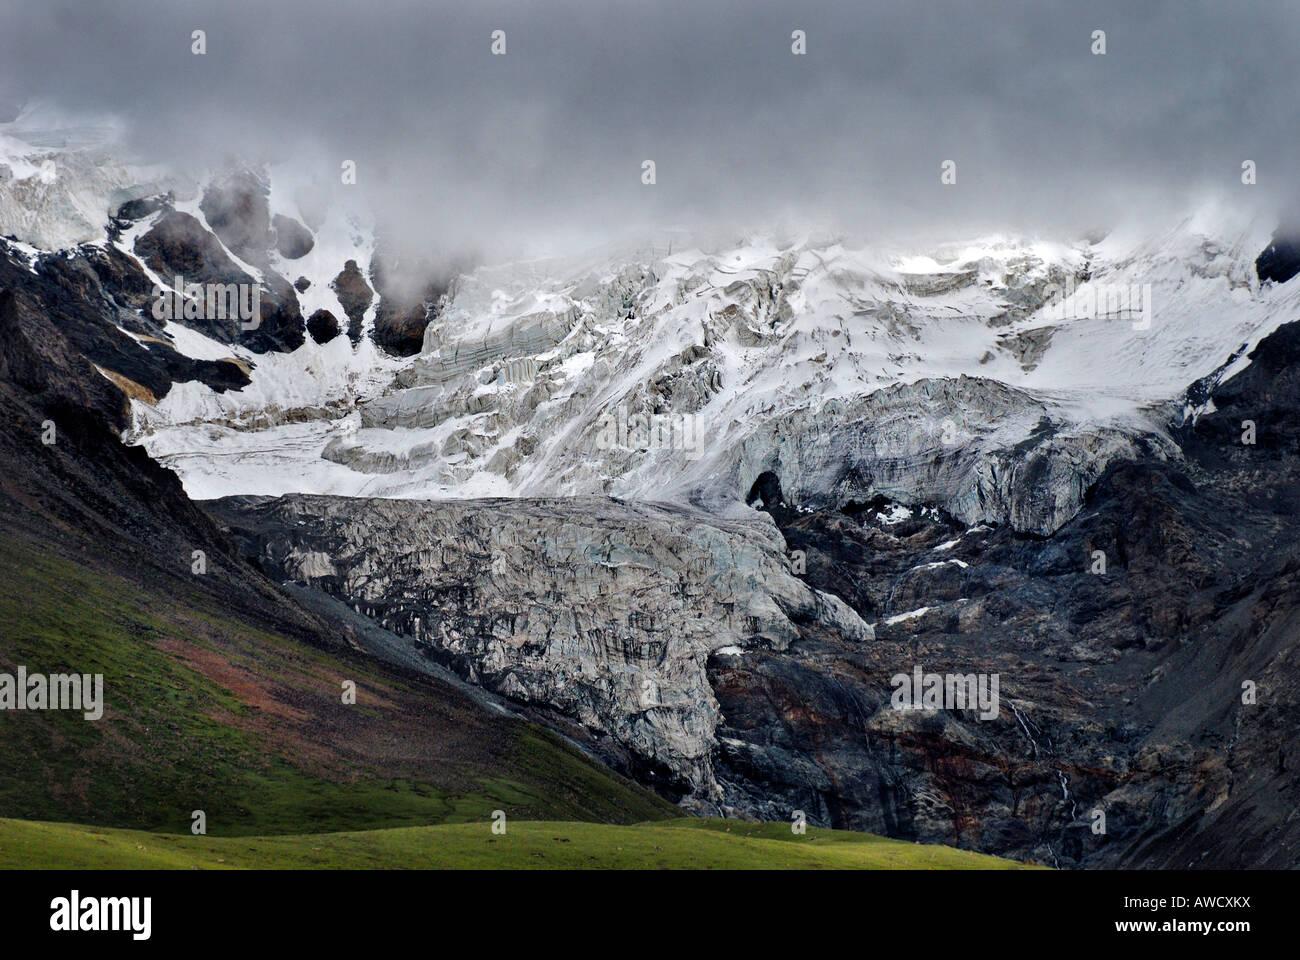 Glacier, between Gyantse and Dangxiong, Tibet - Stock Image